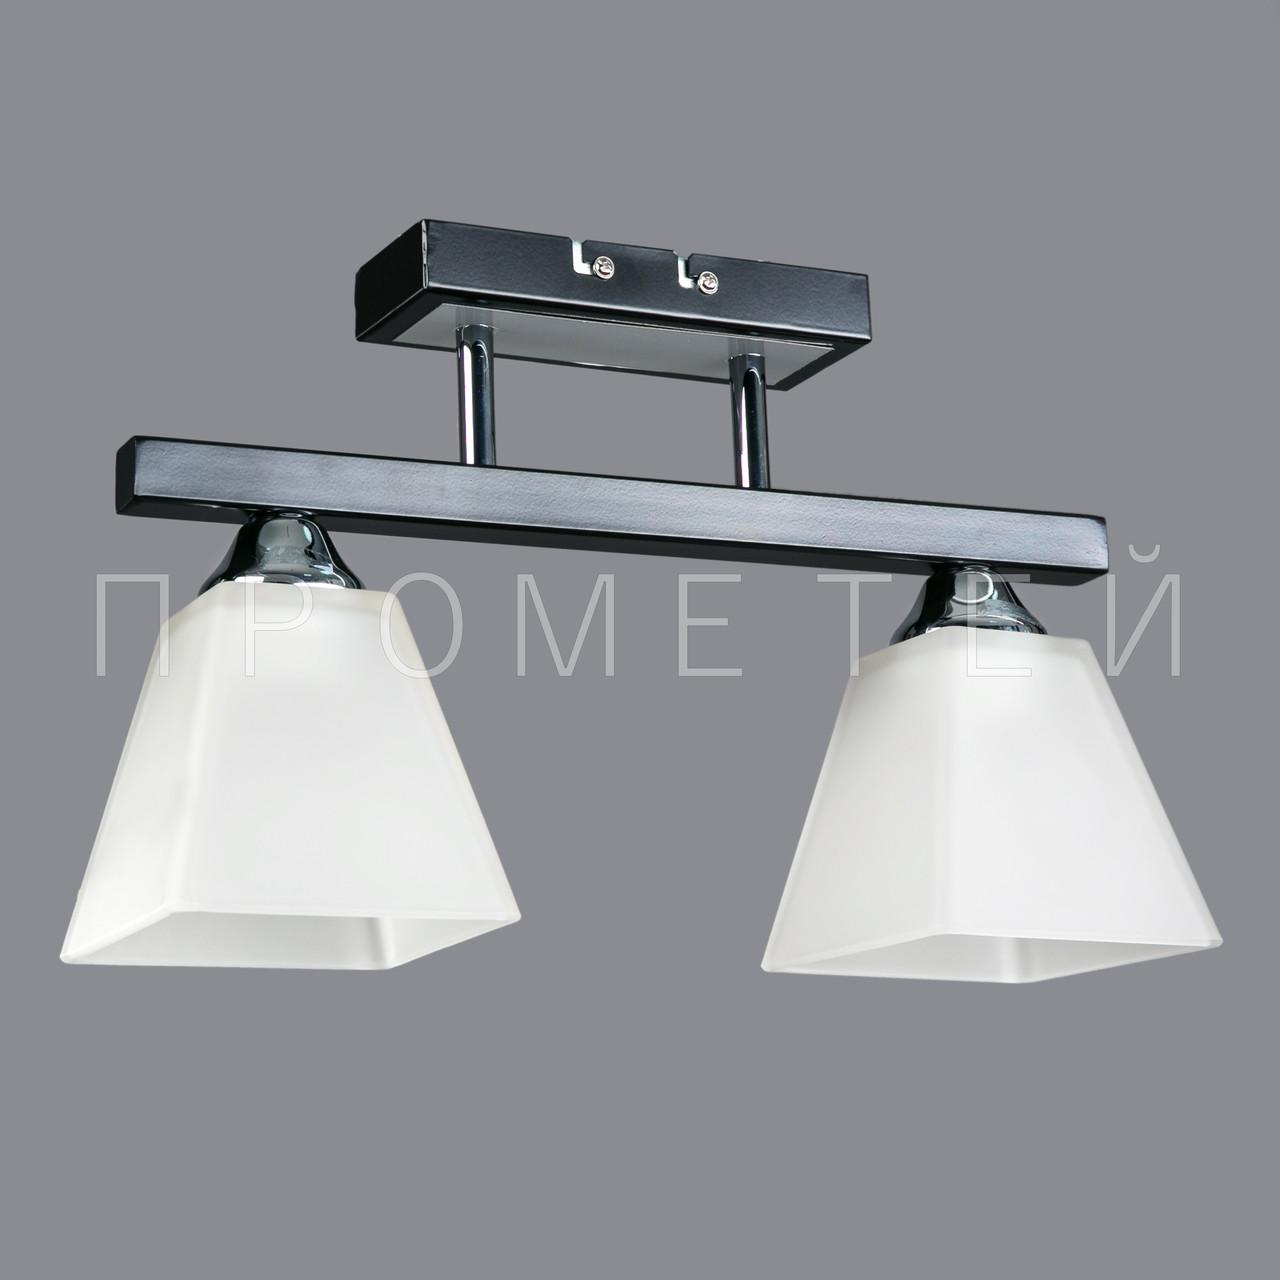 Припотолочная люстра на две лампочки P3-26405/2C/BK+CR+WT